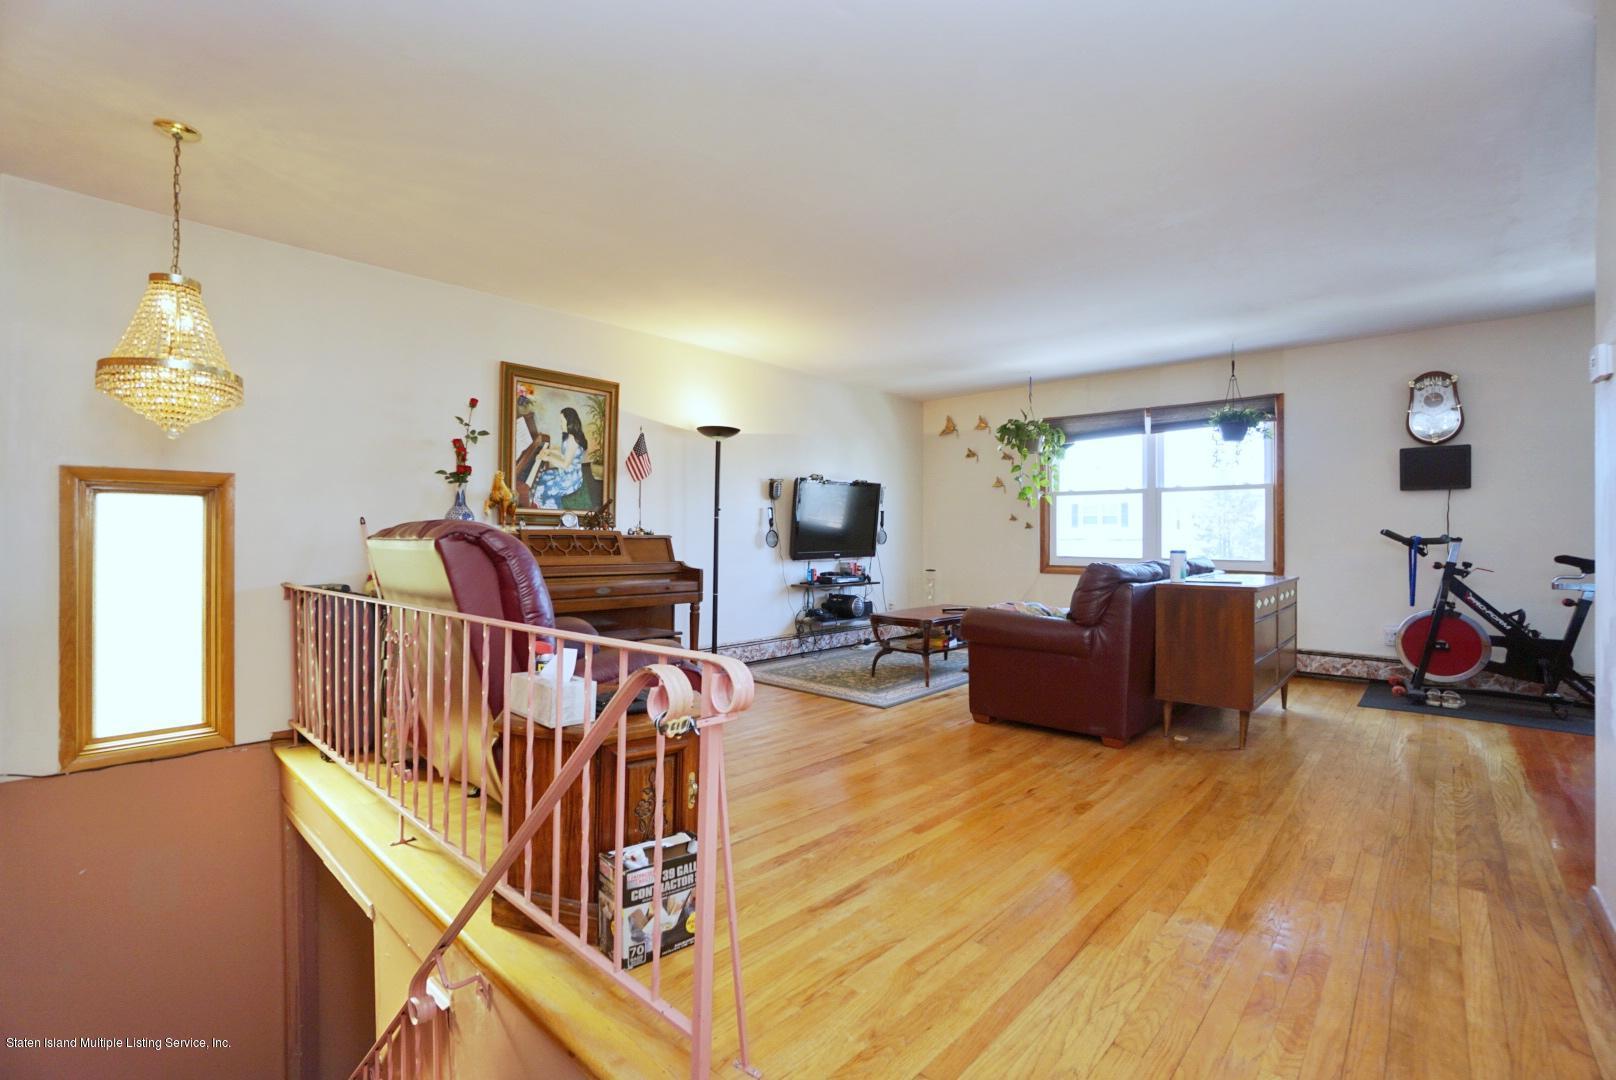 Single Family - Detached 495 Winchester Avenue  Staten Island, NY 10312, MLS-1136561-5